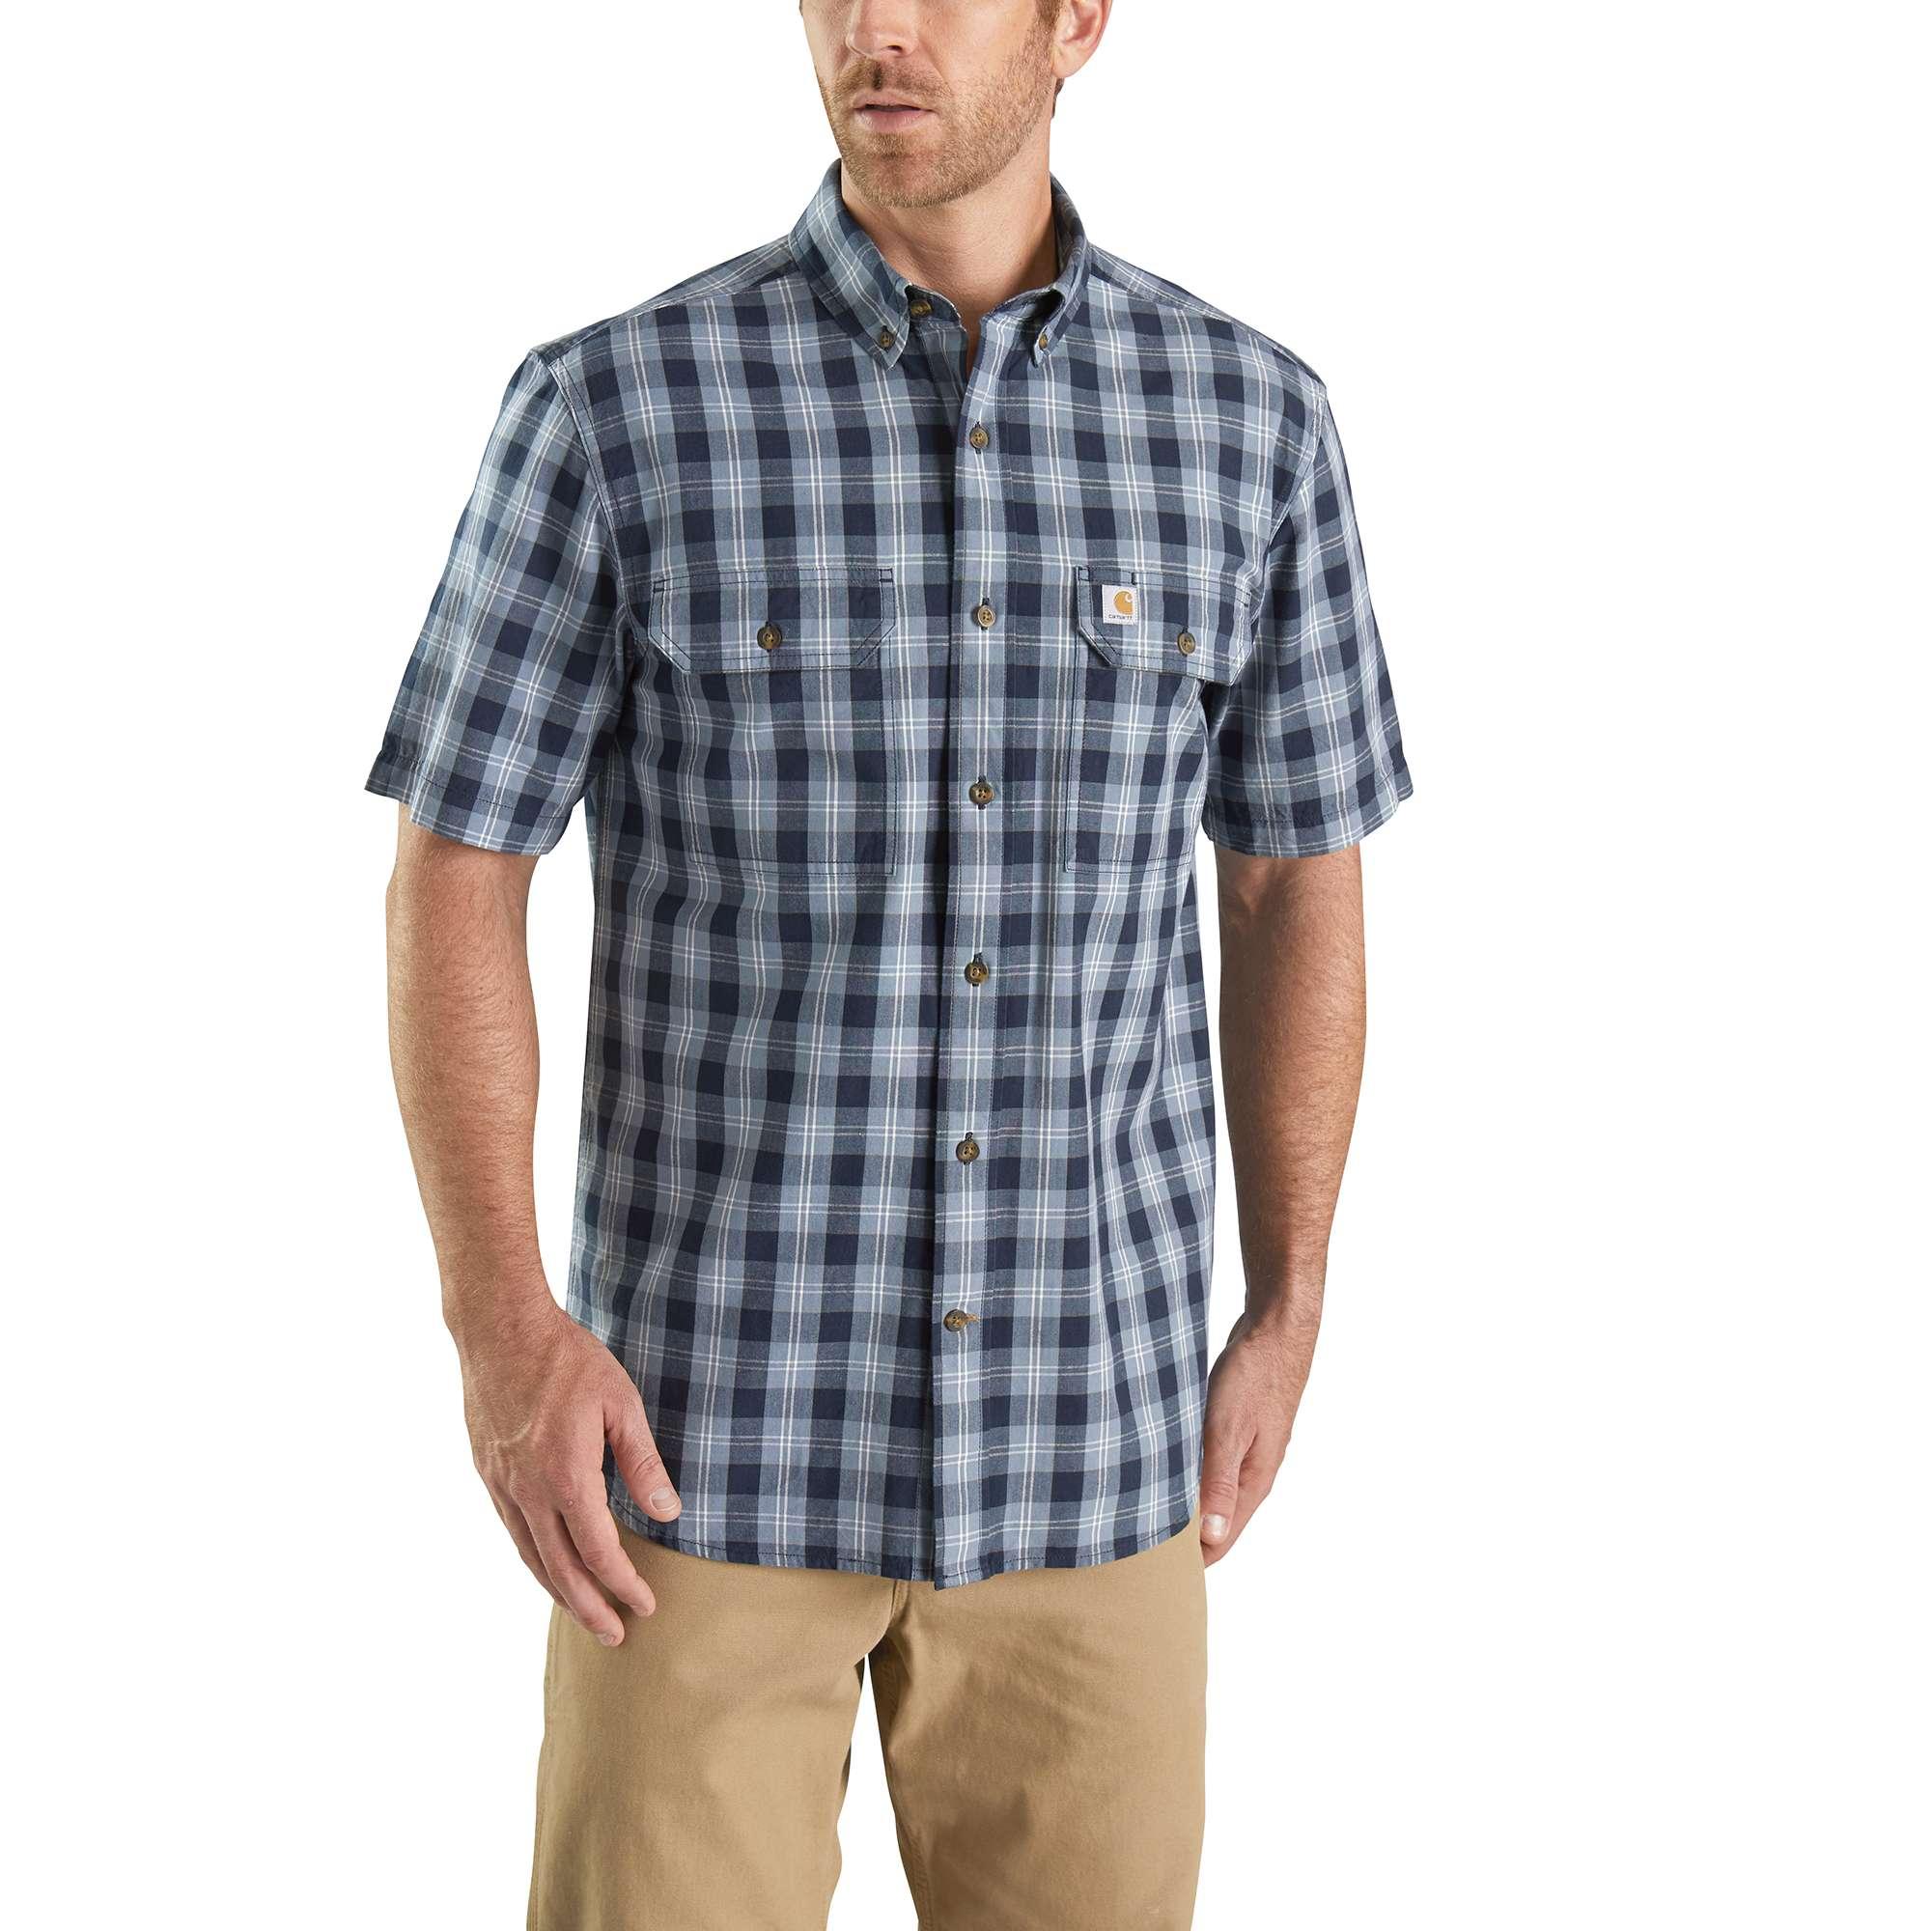 Men's Fort Plaid Chambray Short Sleeve Shirt, Navy, swatch